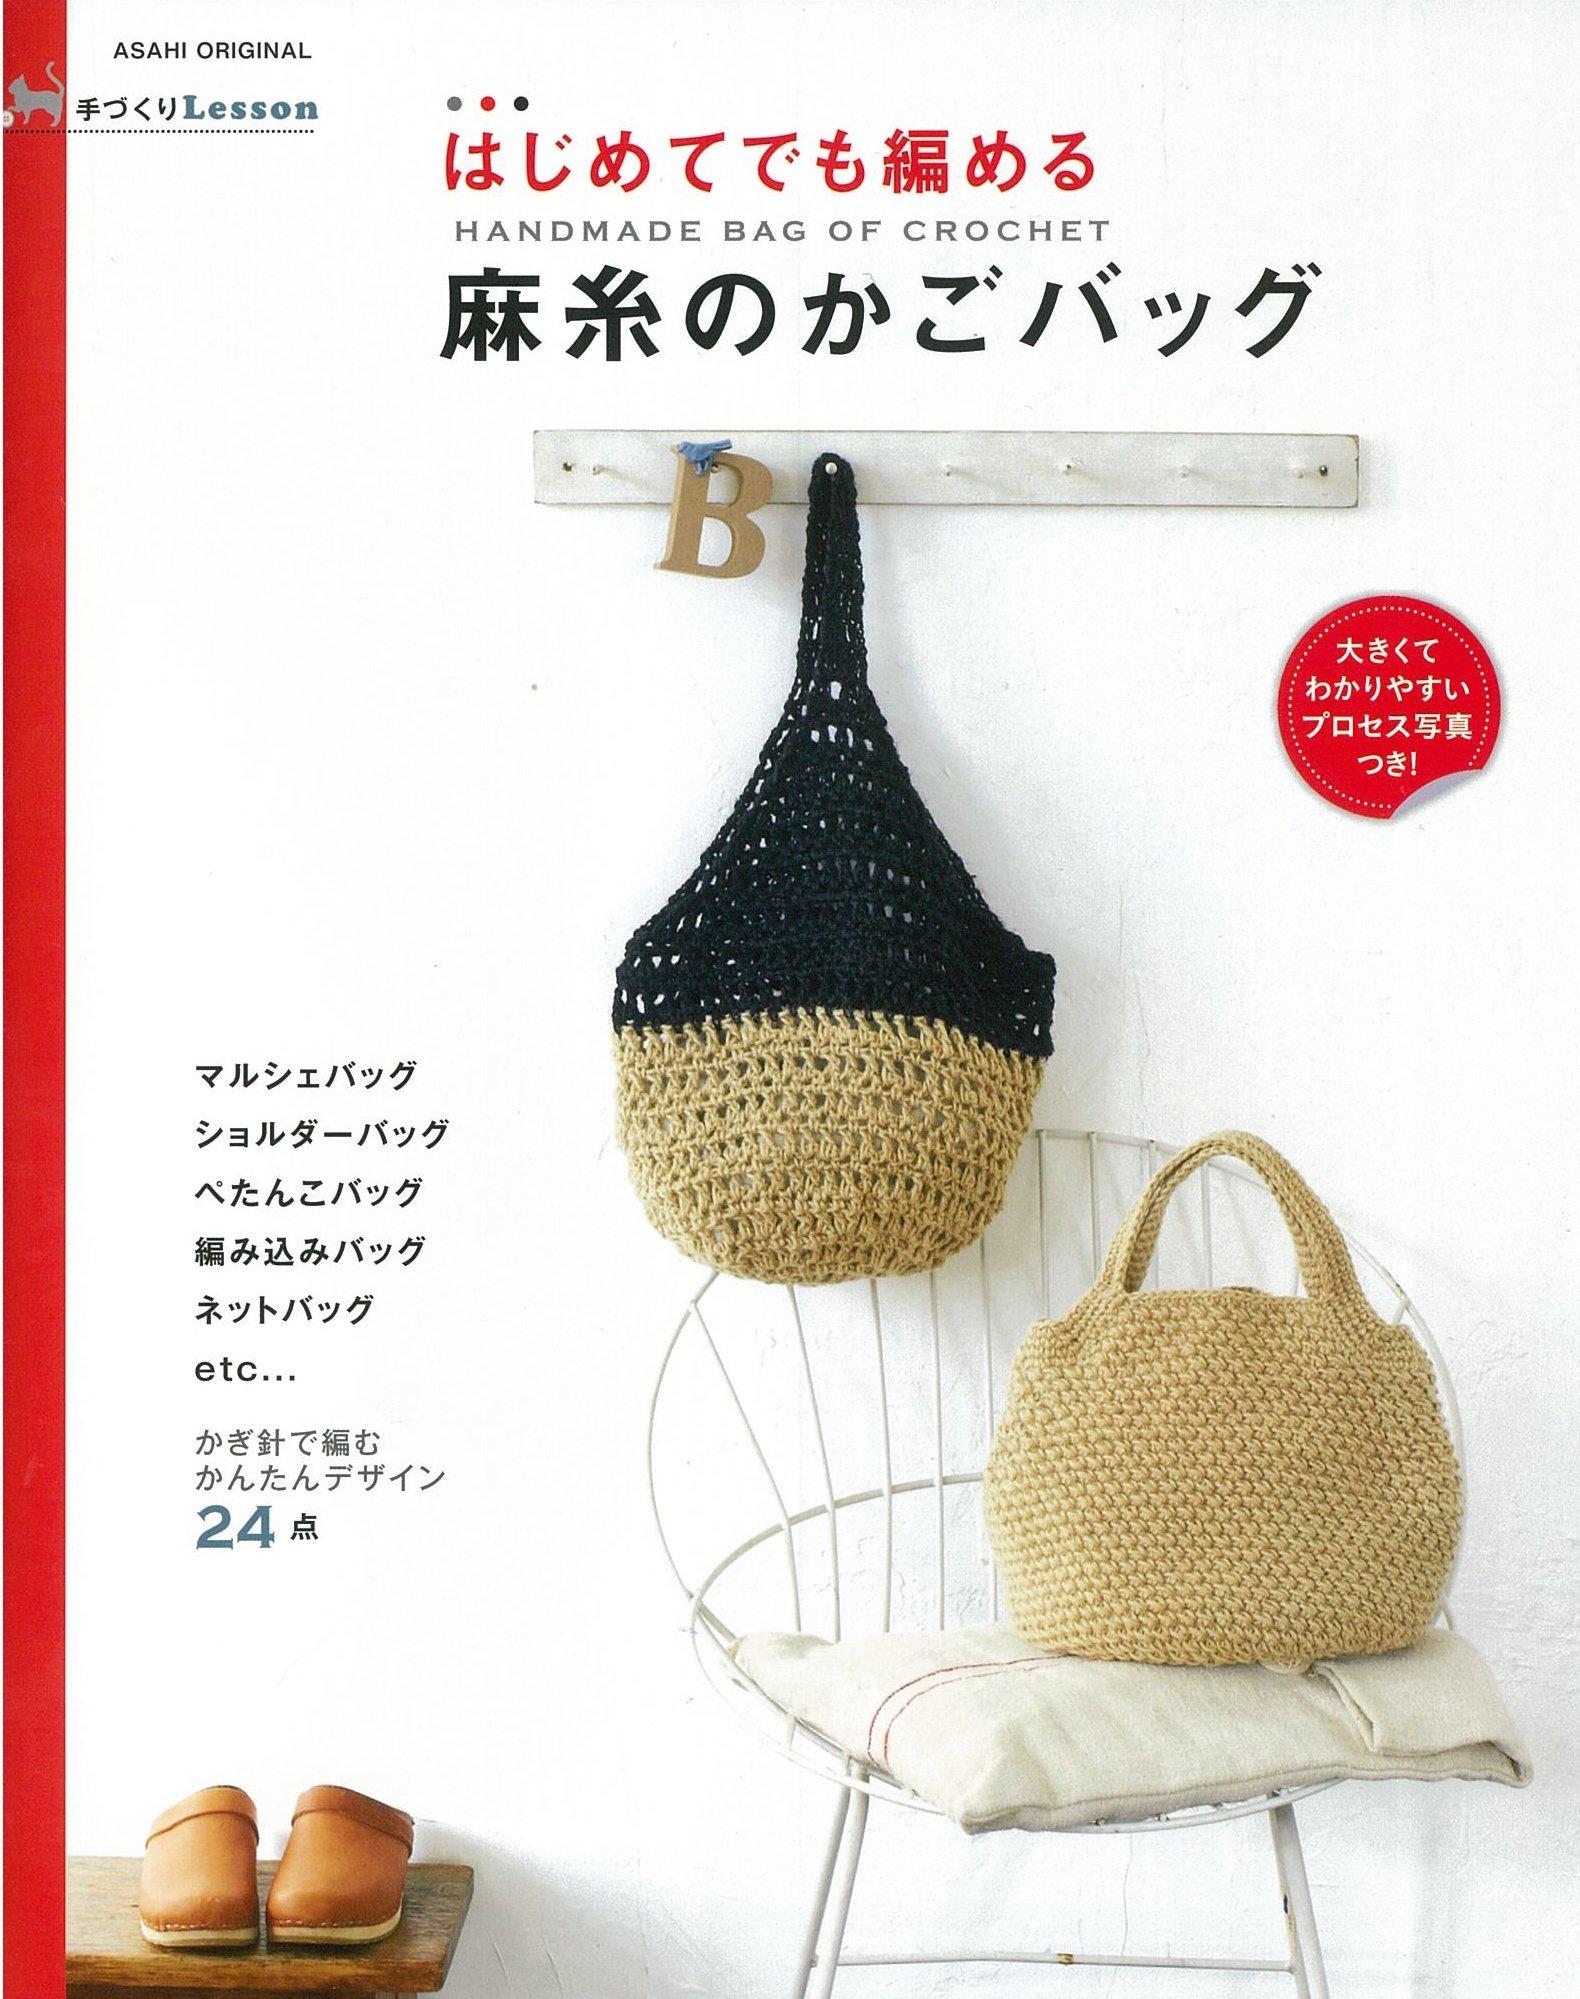 Linen basket bags